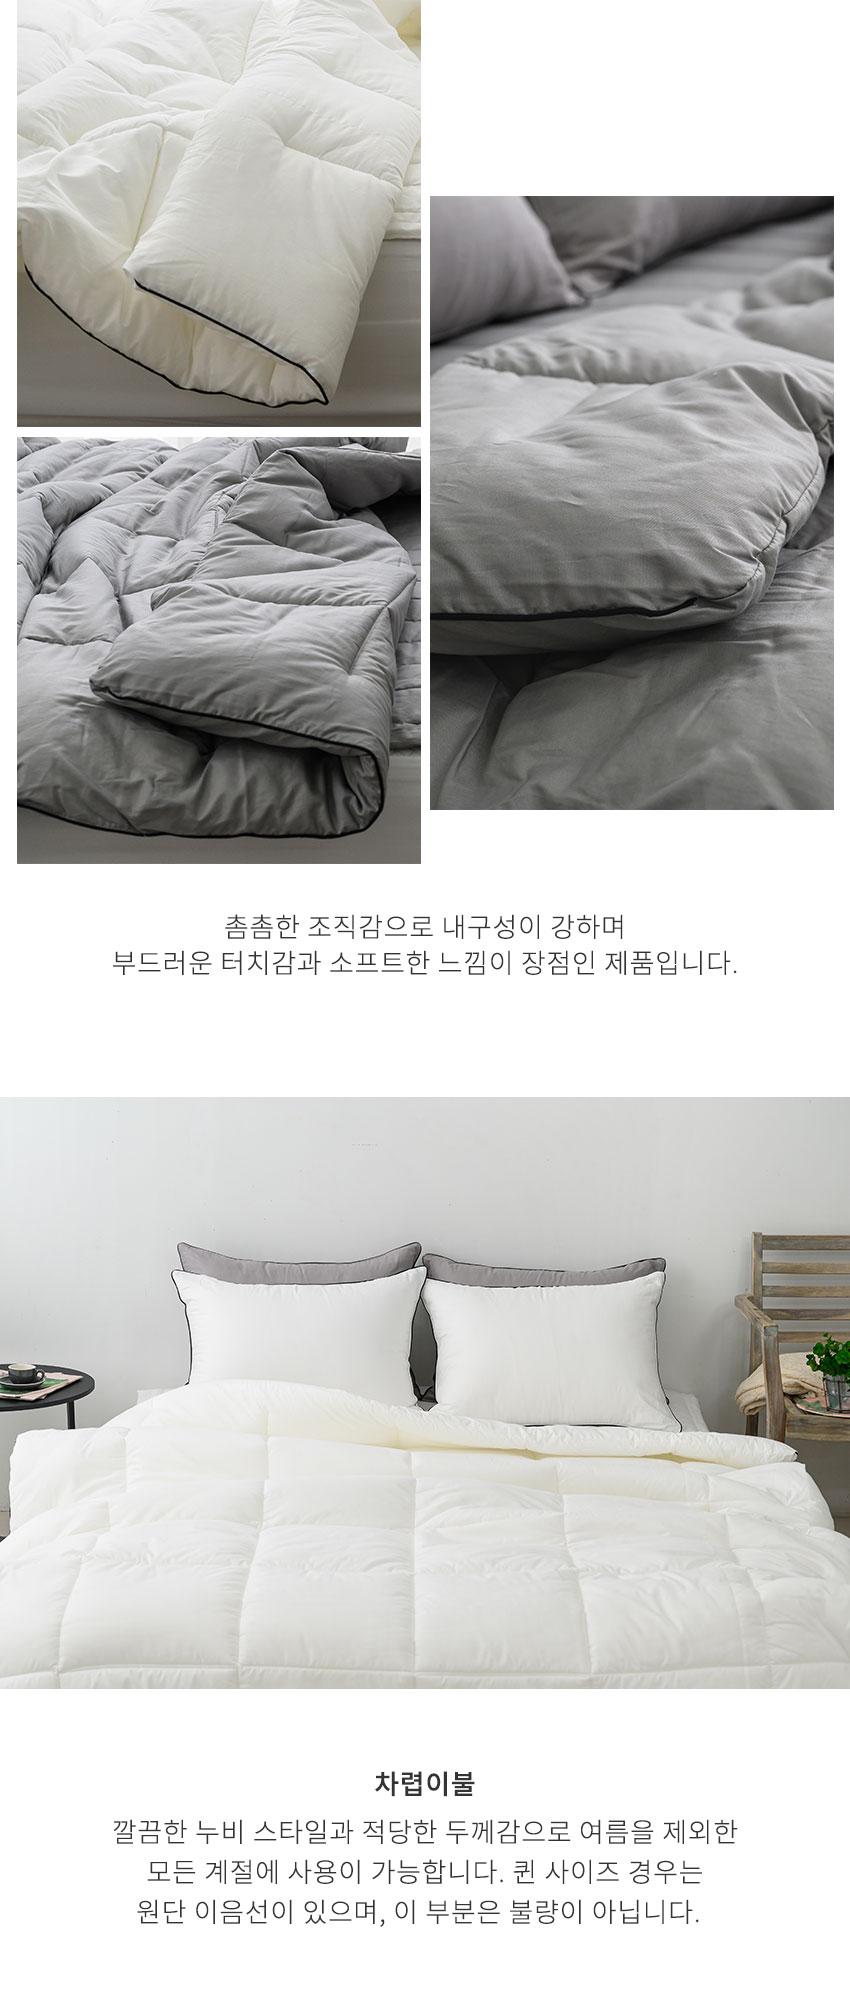 jadam_bed_02.jpg